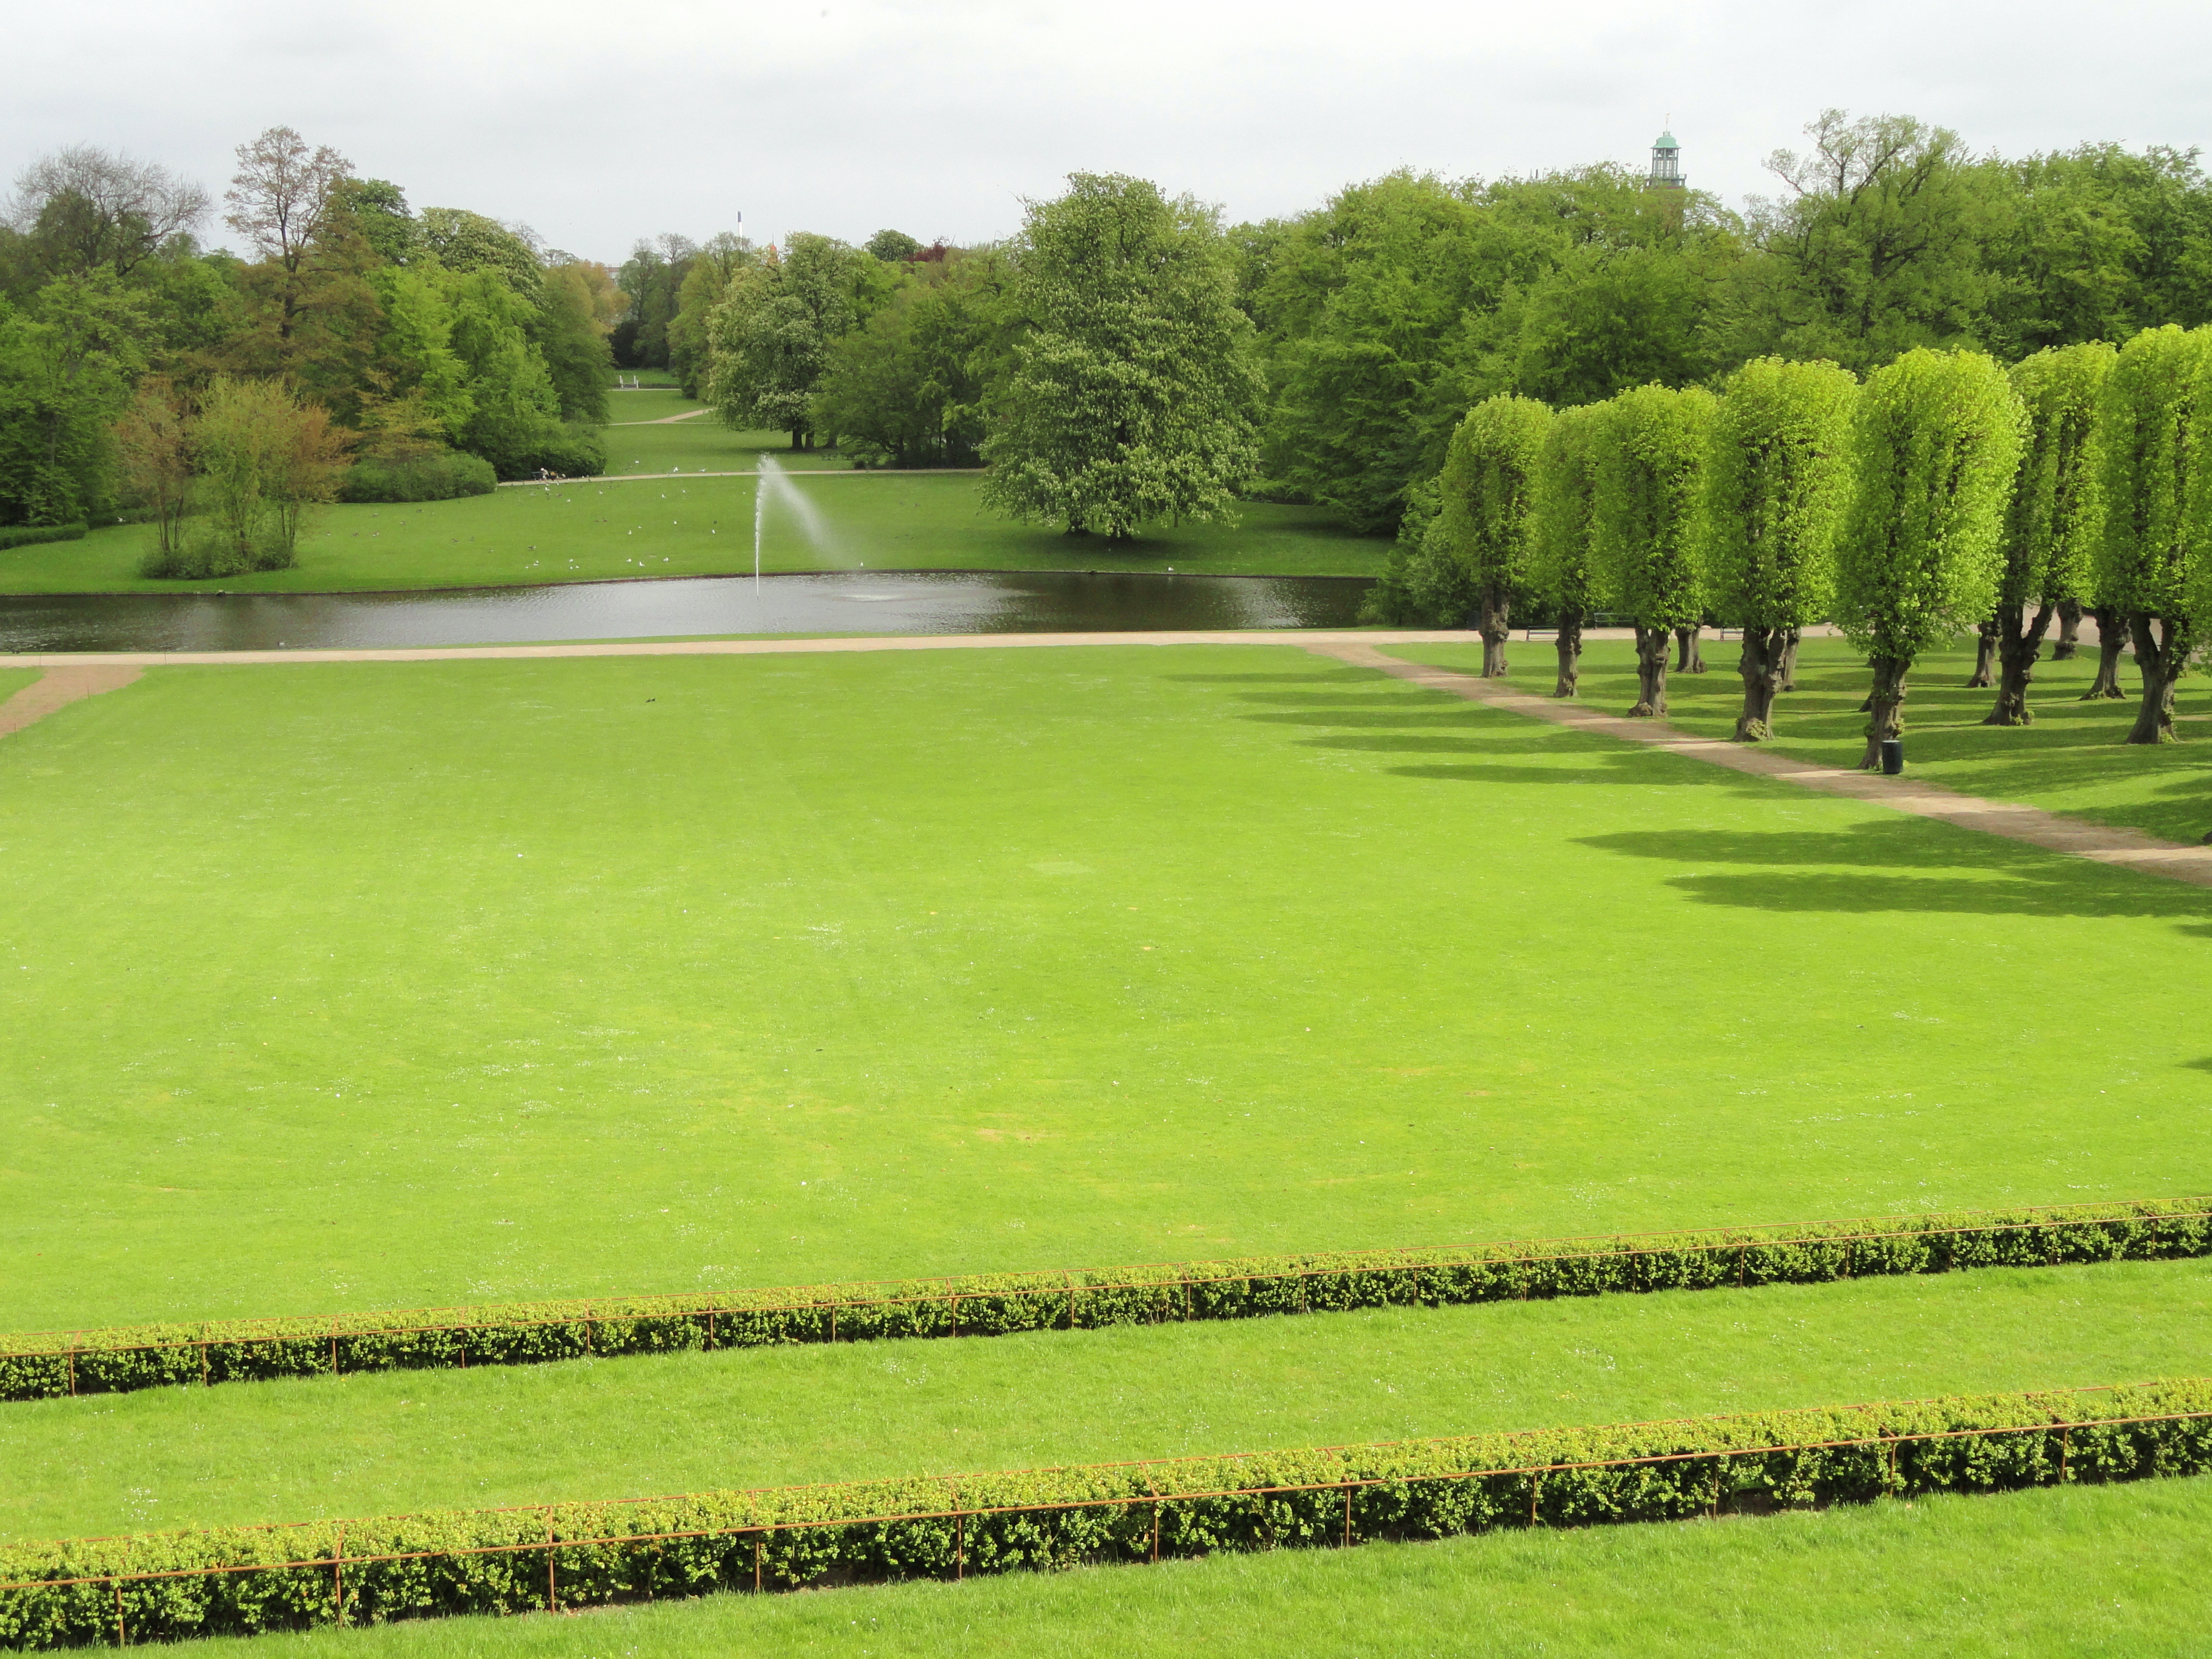 File:Lawn - Frederiksberg Have - Copenhagen - DSC08938.JPG